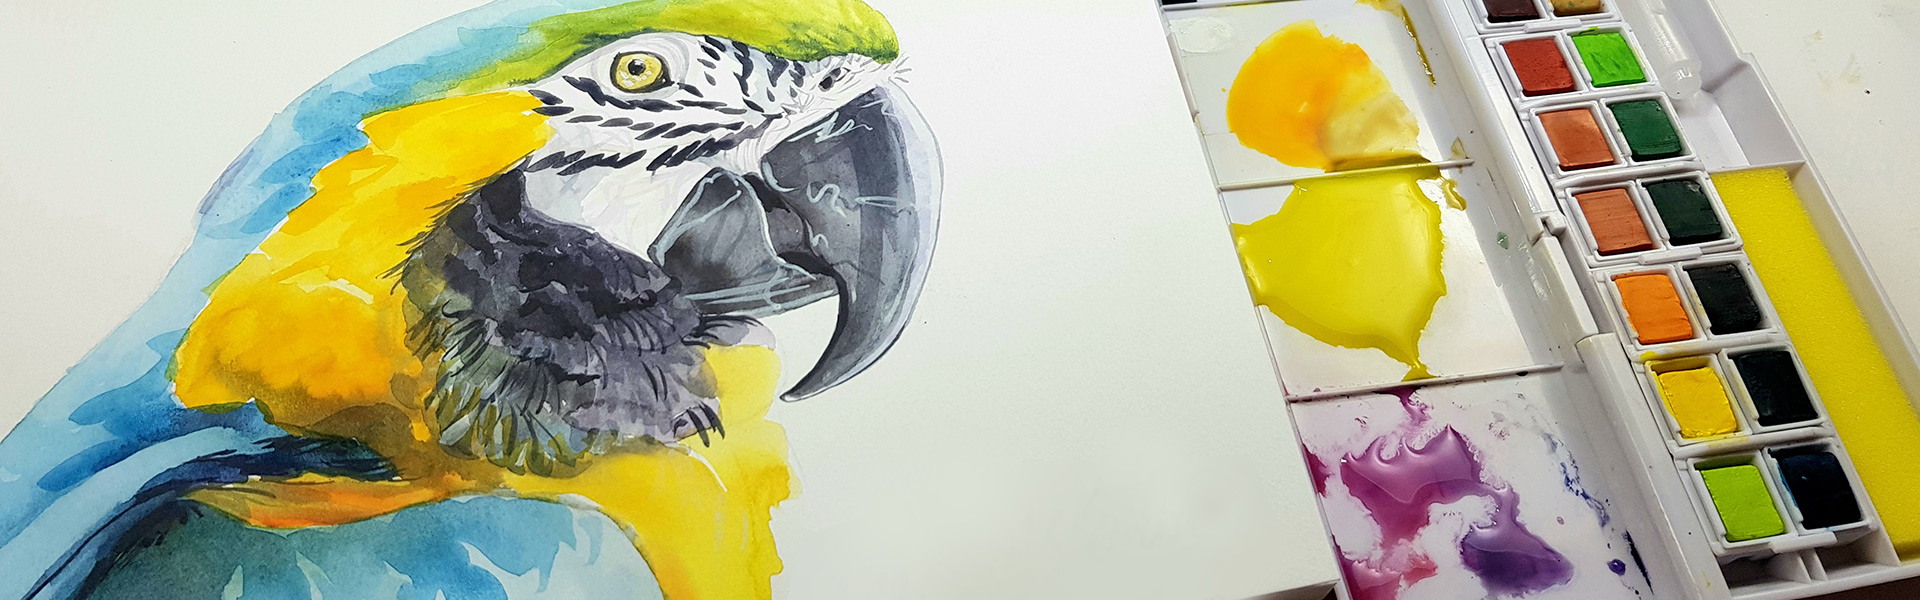 Derwent Inktense Paint Pan Set: Drawing a Macaw with Julia Woning